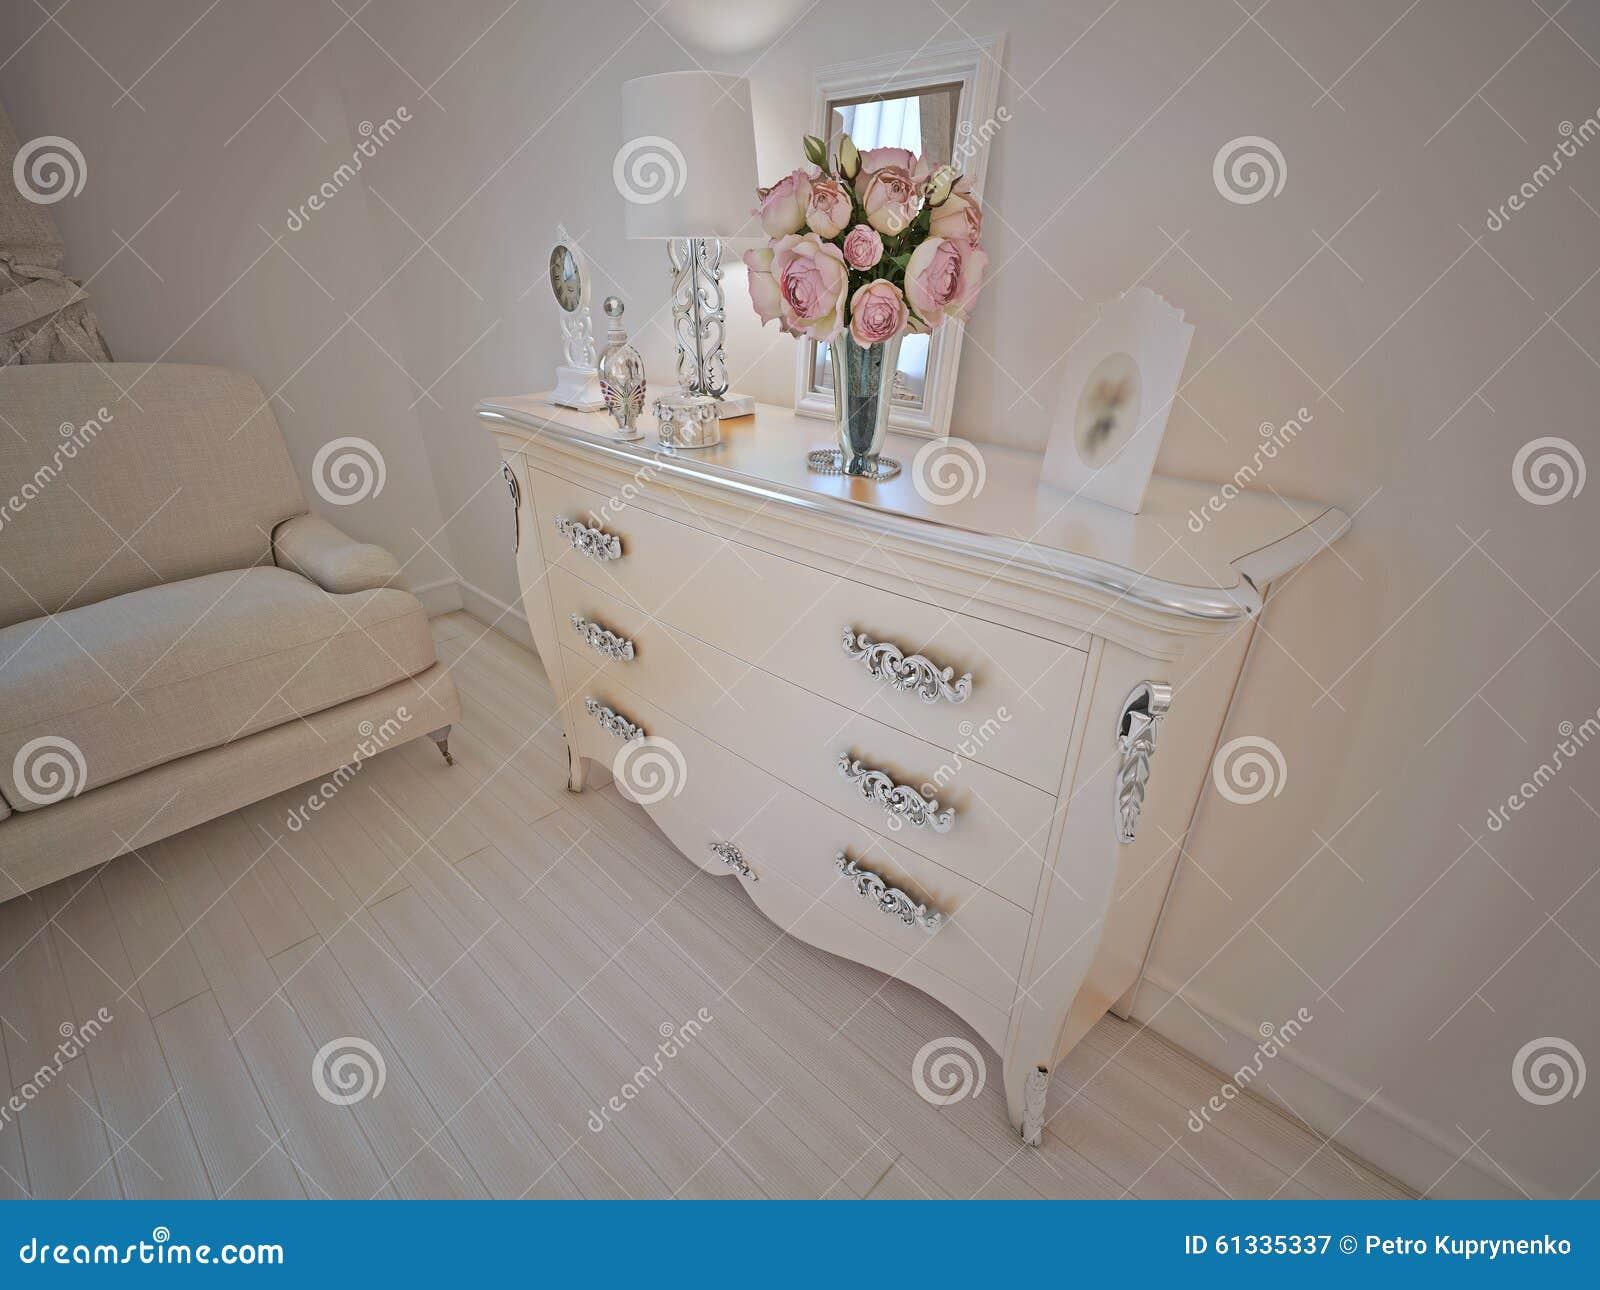 Console in art deco lounge stock image 61335337 - Deco lounge grijs en beige ...